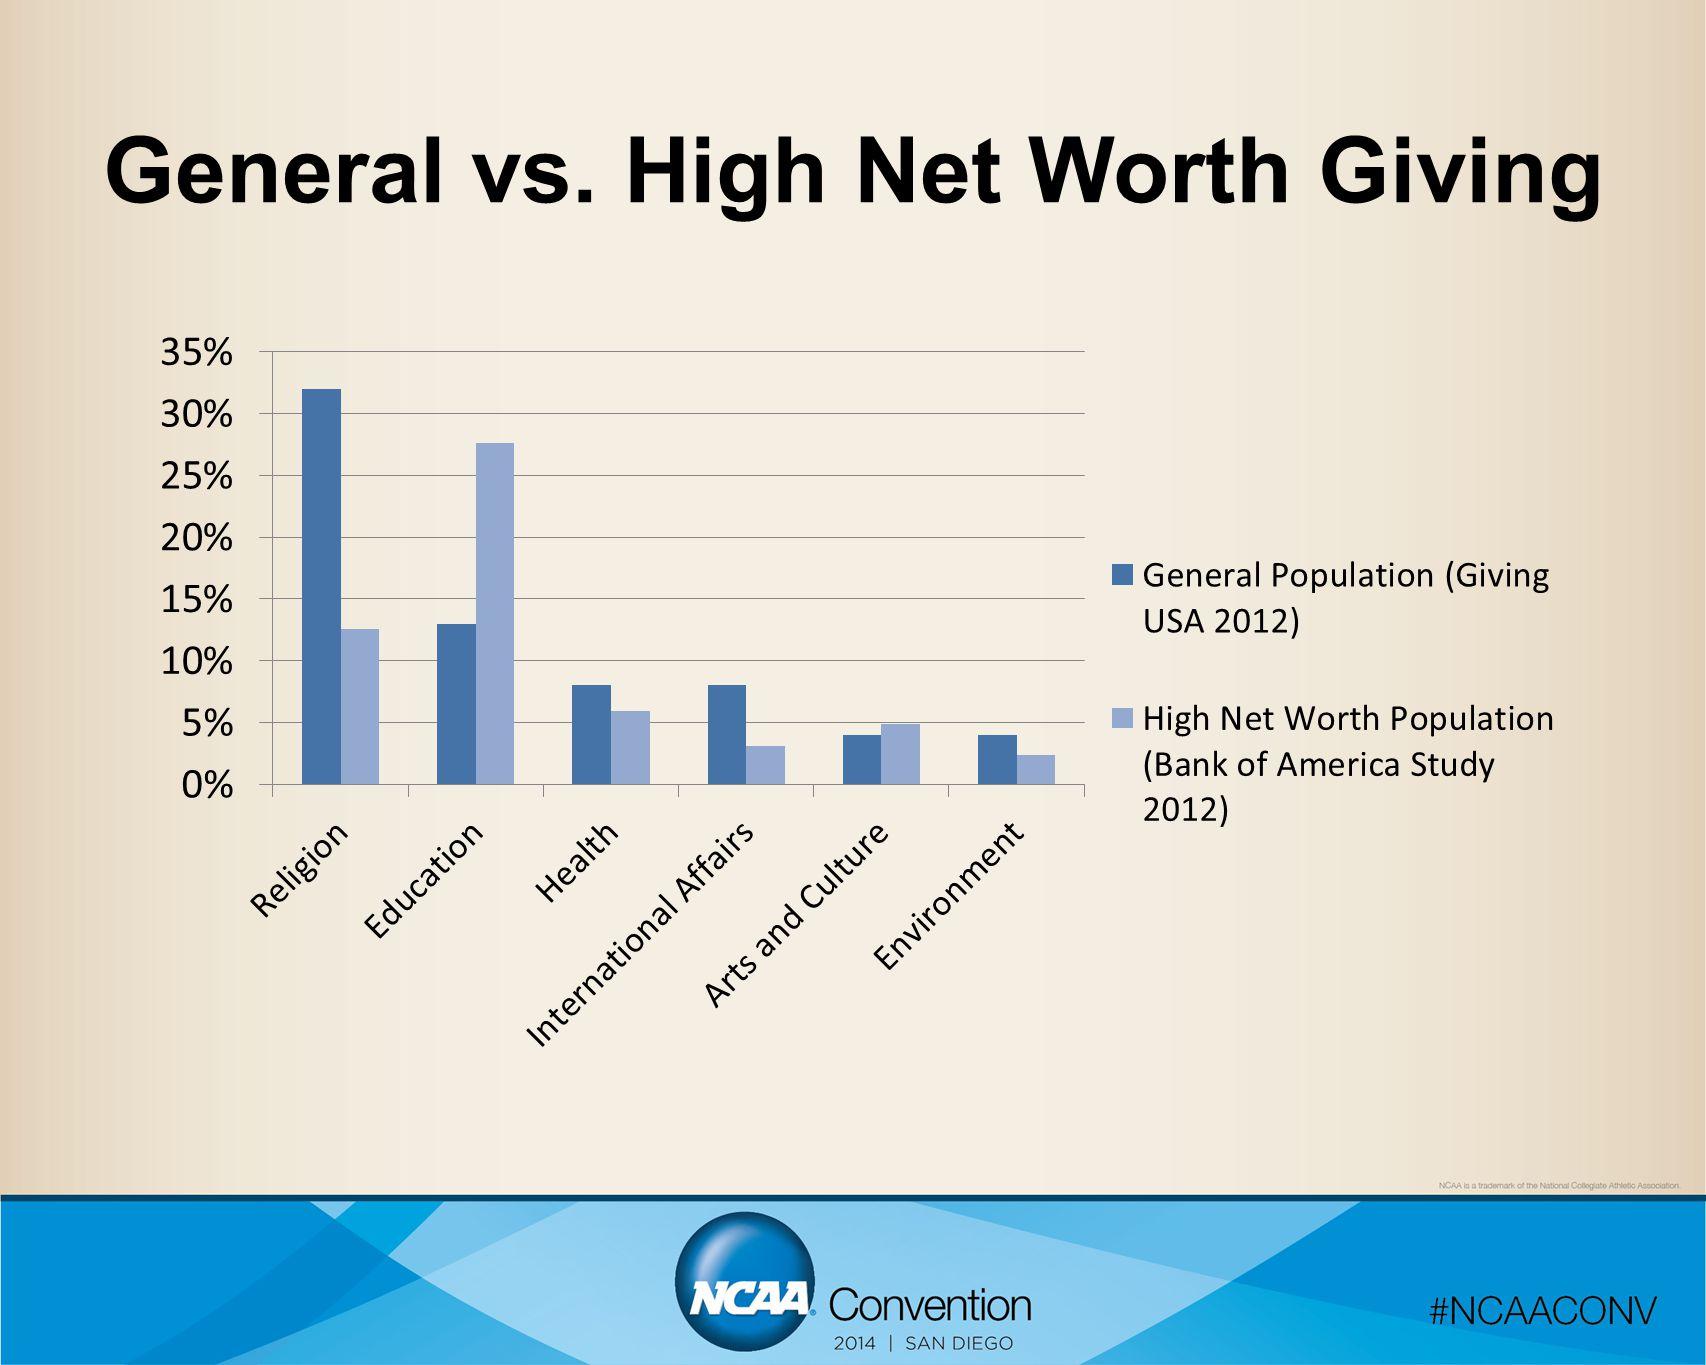 General vs. High Net Worth Giving